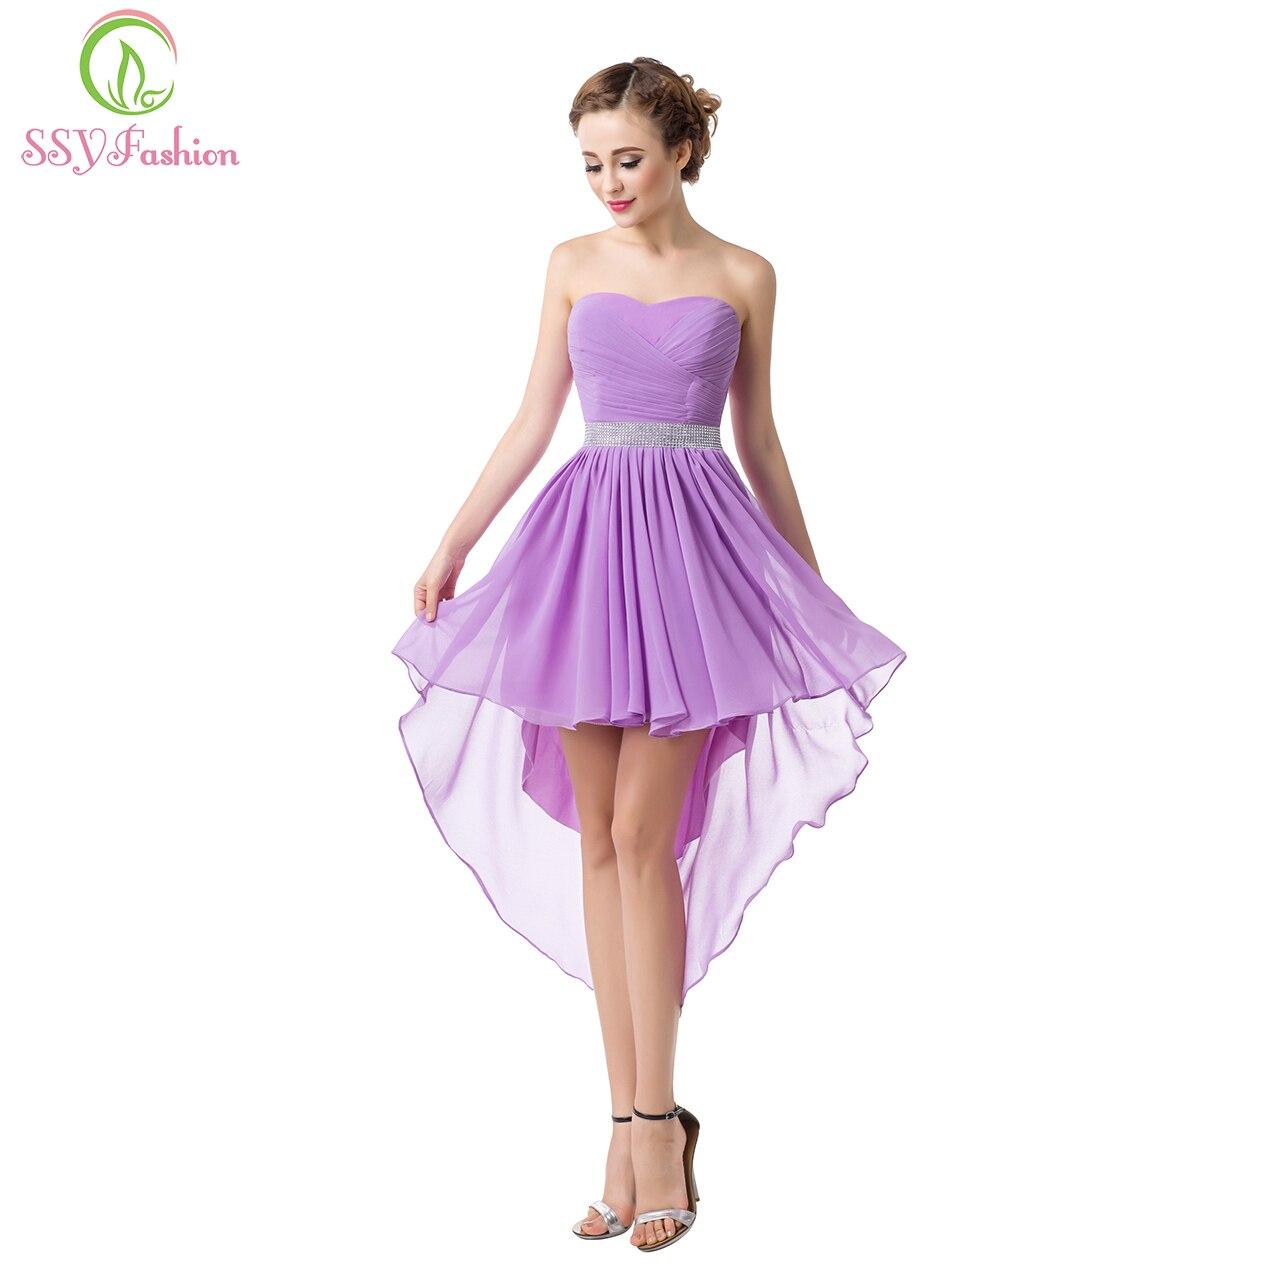 Bridesmaid     Dresses   SSYFashion Women's Sexy Strapless Asymmetrical Chiffon Formal Prom   Dress   Plus Size Bridal Party Gowns